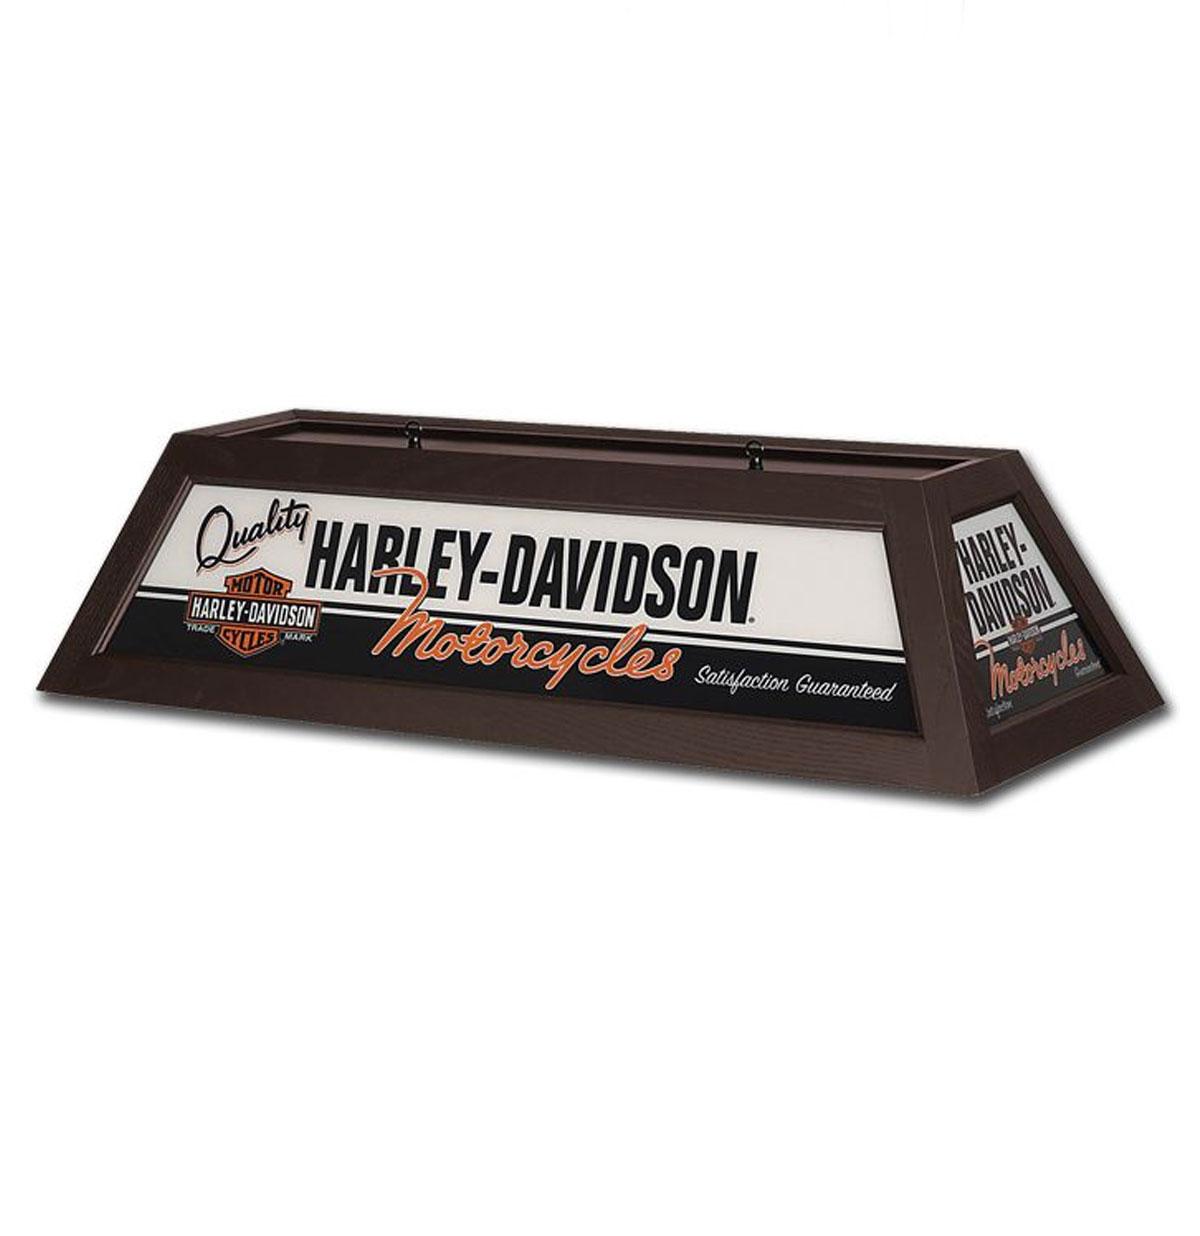 Harley-Davidson Quality Motorcycles Billiard Lamp - Brown Finish